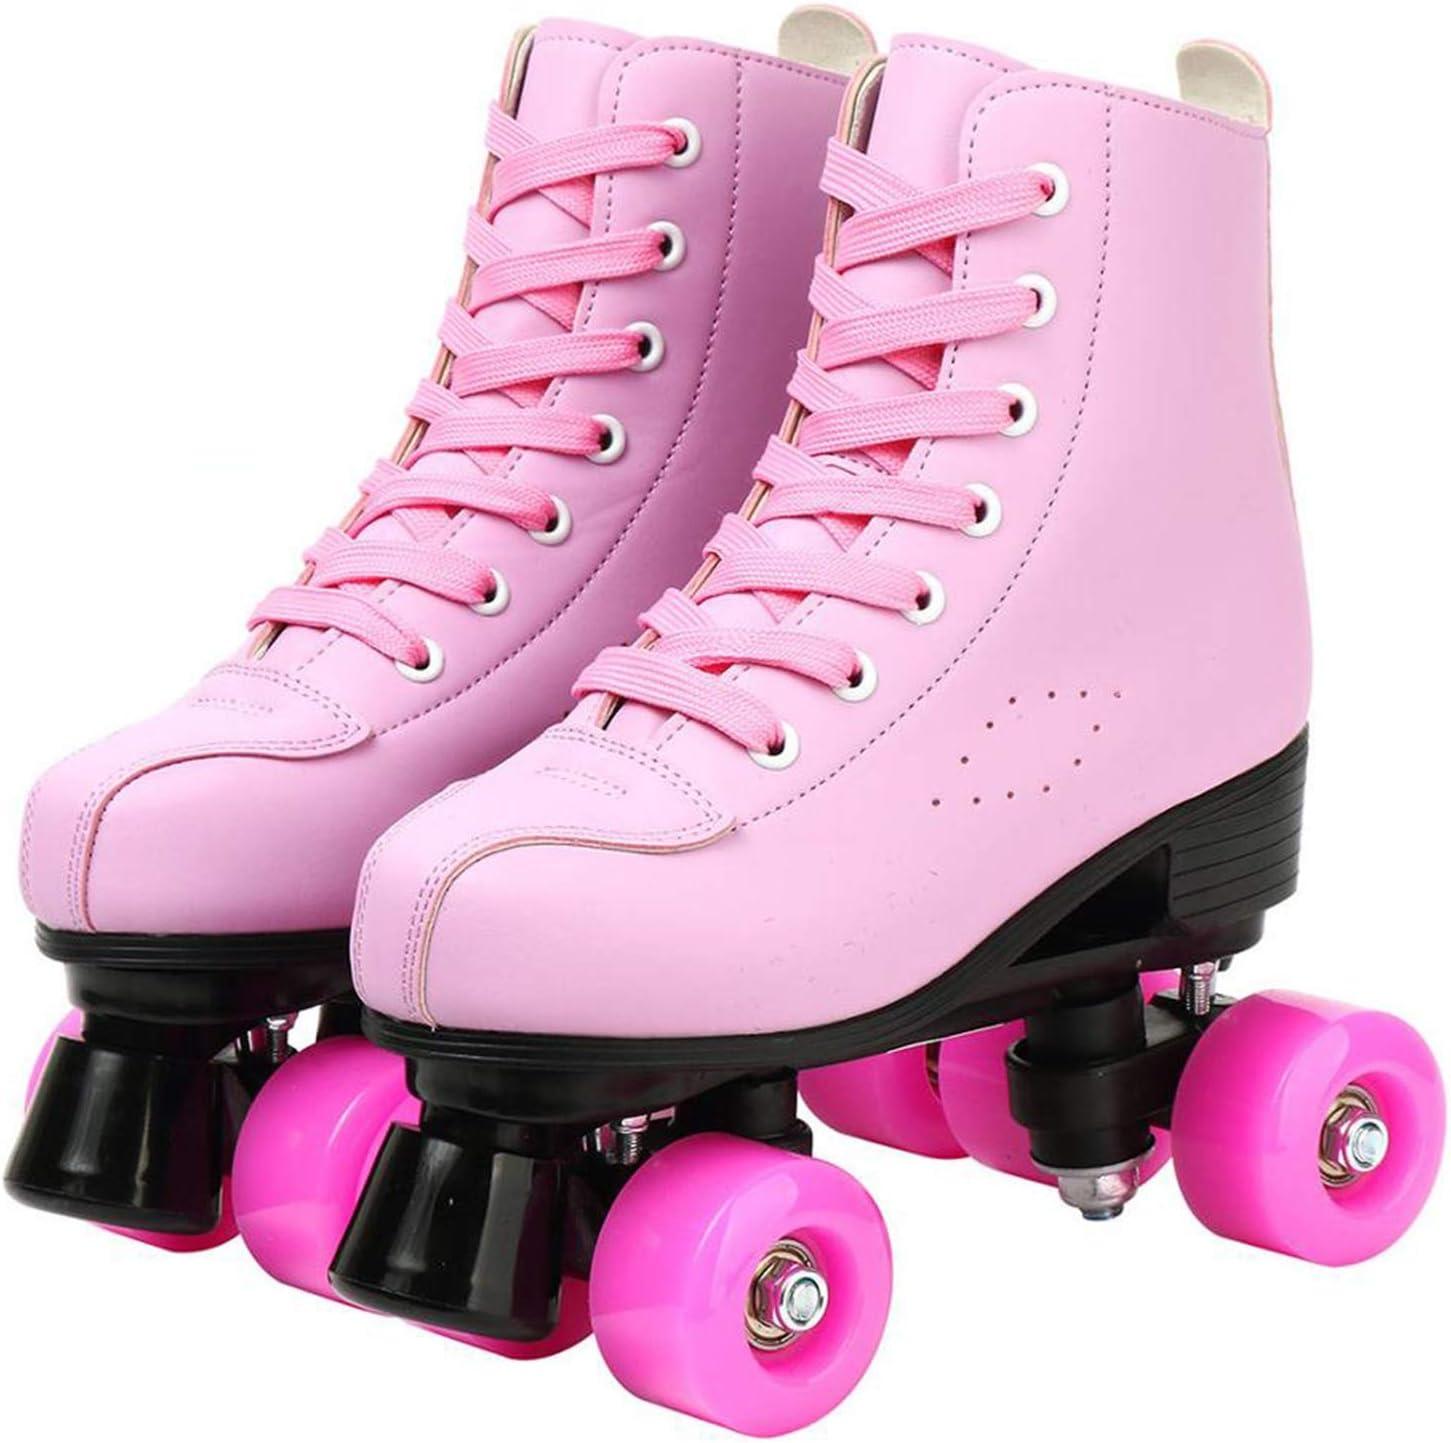 Women Max 75% OFF Men 5 Choice Pu Microfiber Sli Skates Ranking TOP18 Skating Shoes Roller